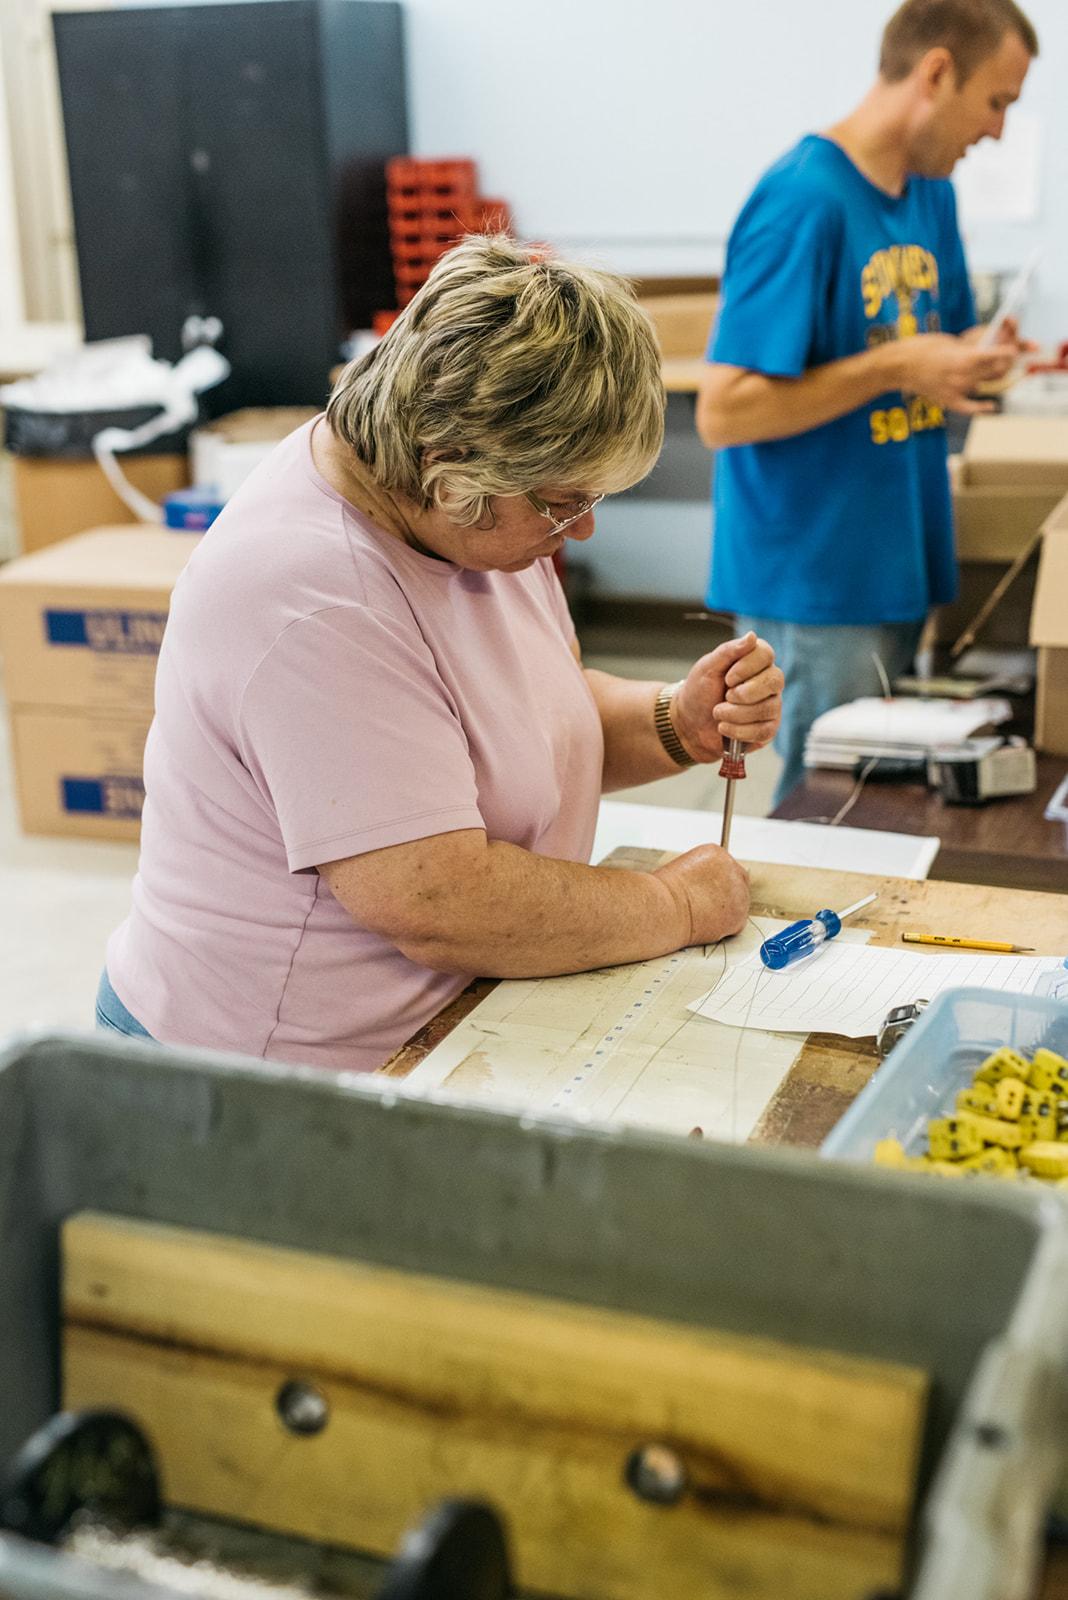 Community Work Center in Berks County